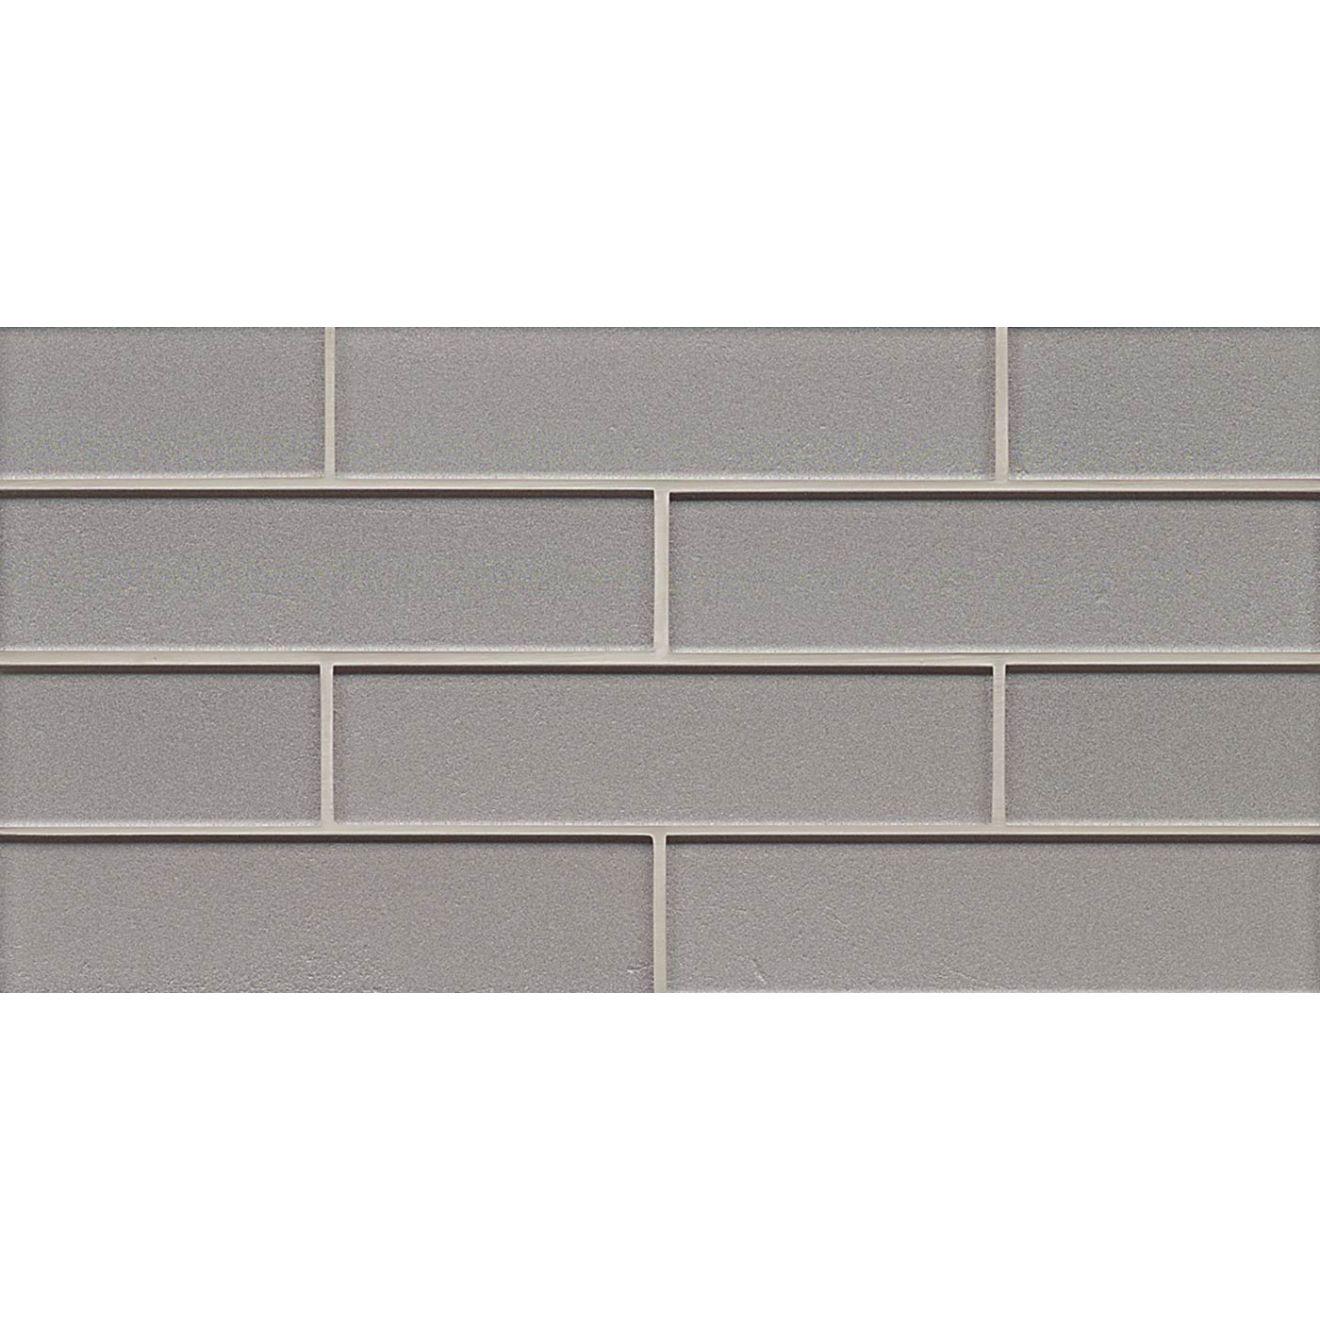 "Manhattan 2"" x 8"" Wall Mosaic in Platinum"